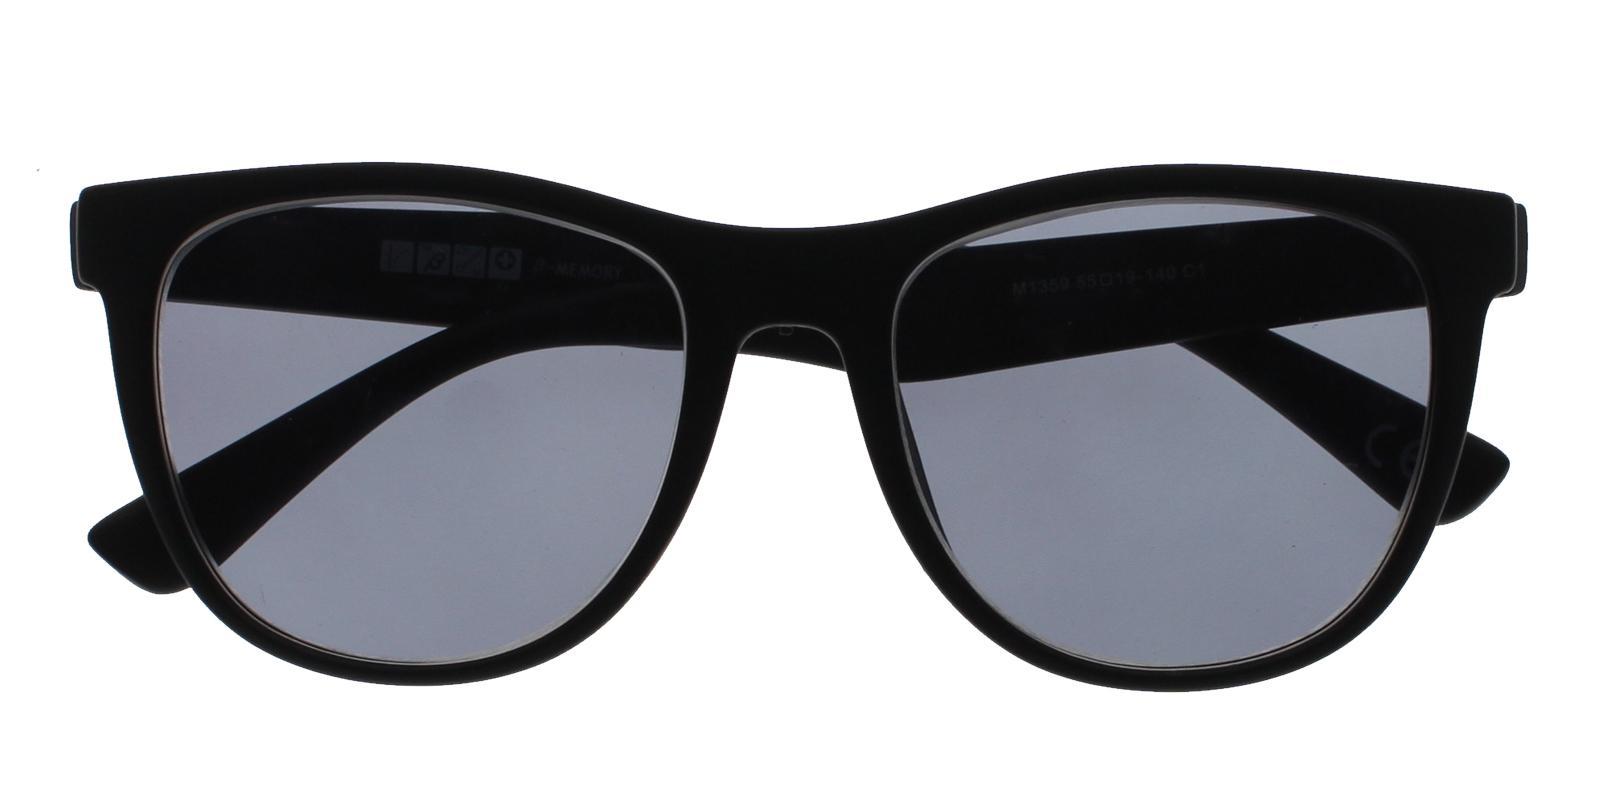 Hallstead Black TR Sunglasses , UniversalBridgeFit Frames from ABBE Glasses